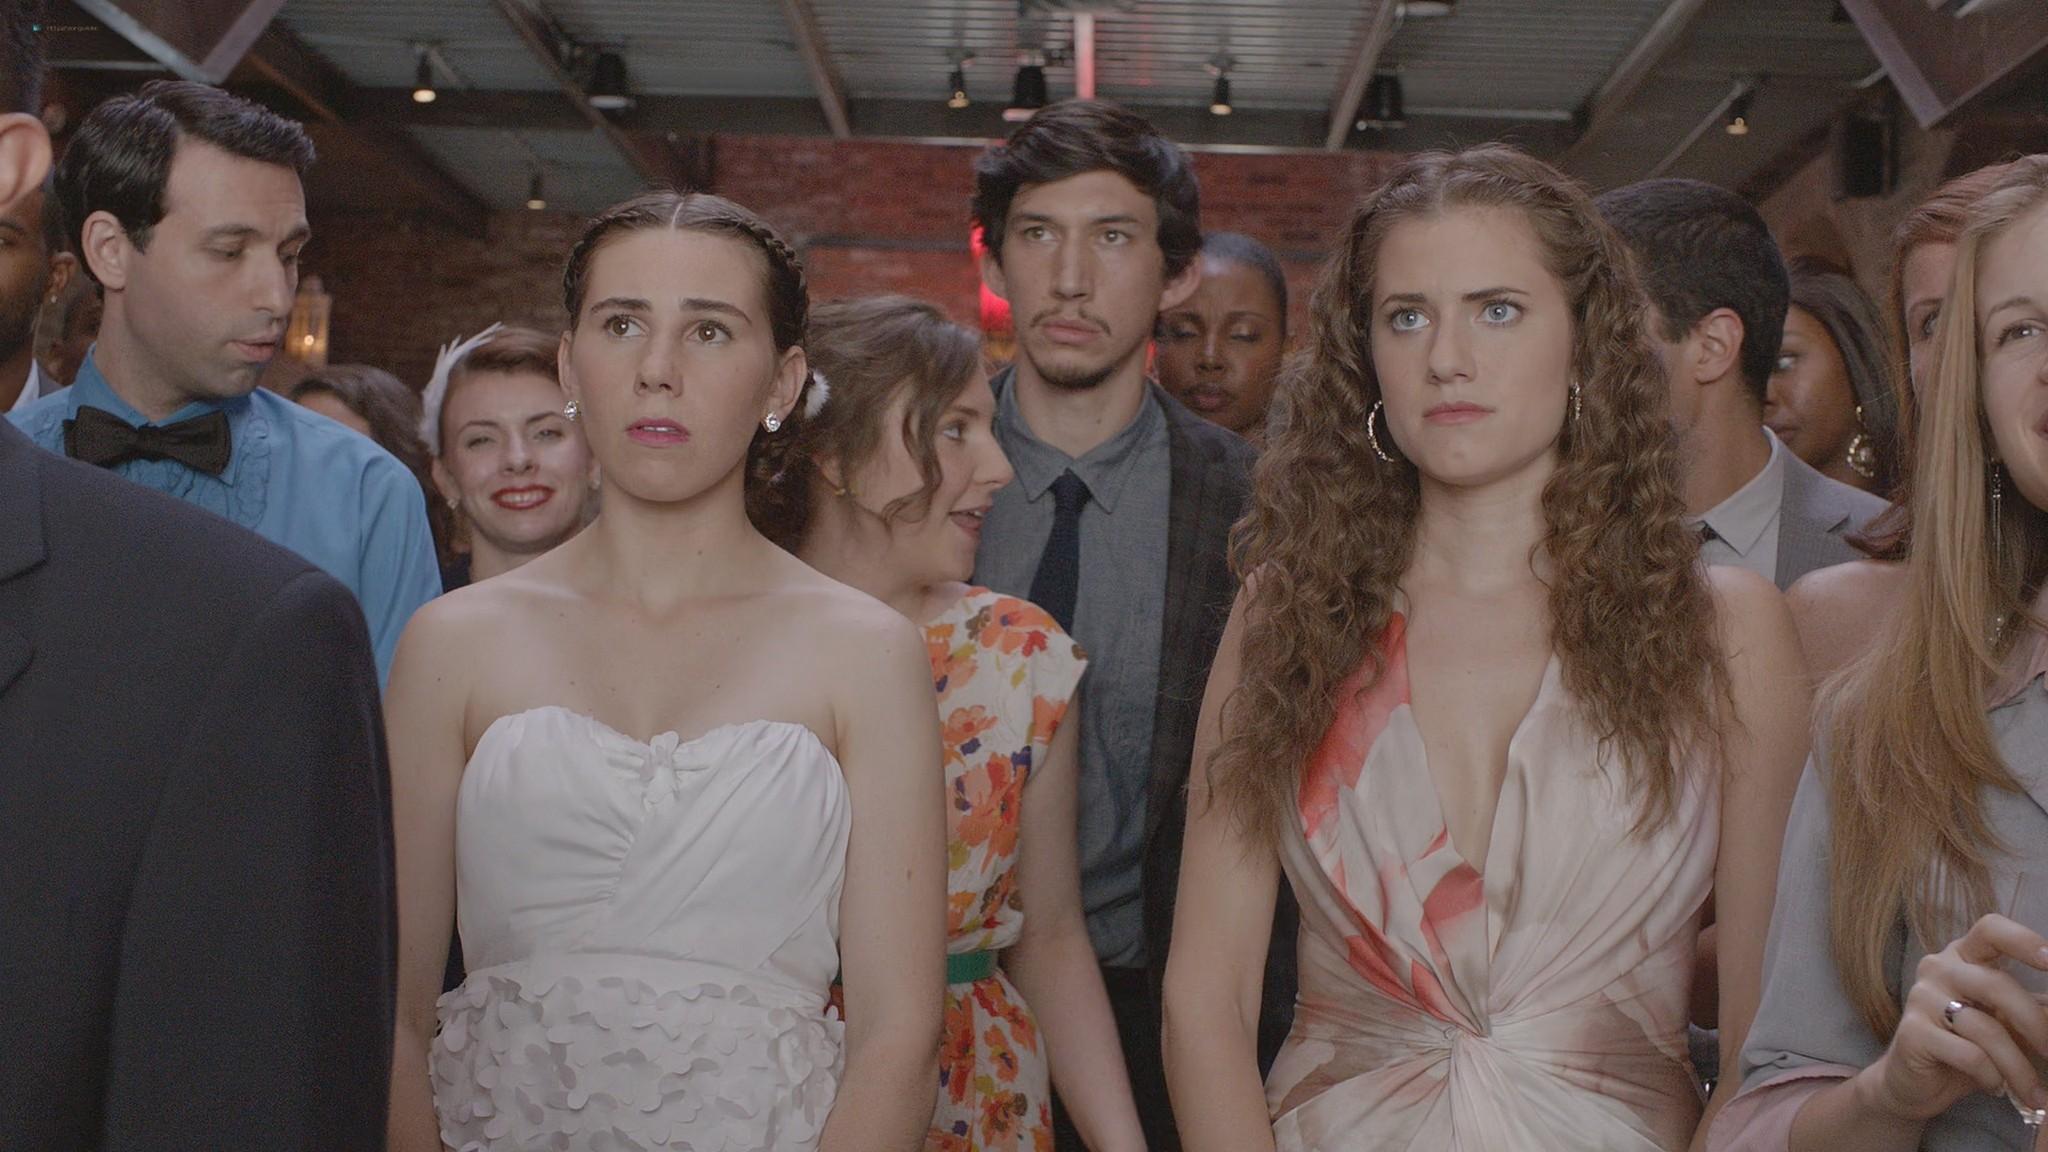 Allison Williams hot Lena Dunham nude Zosia Mamet Jemima Kirke nude and sexy Girls 2012 s1e6 10 1080p Web 14